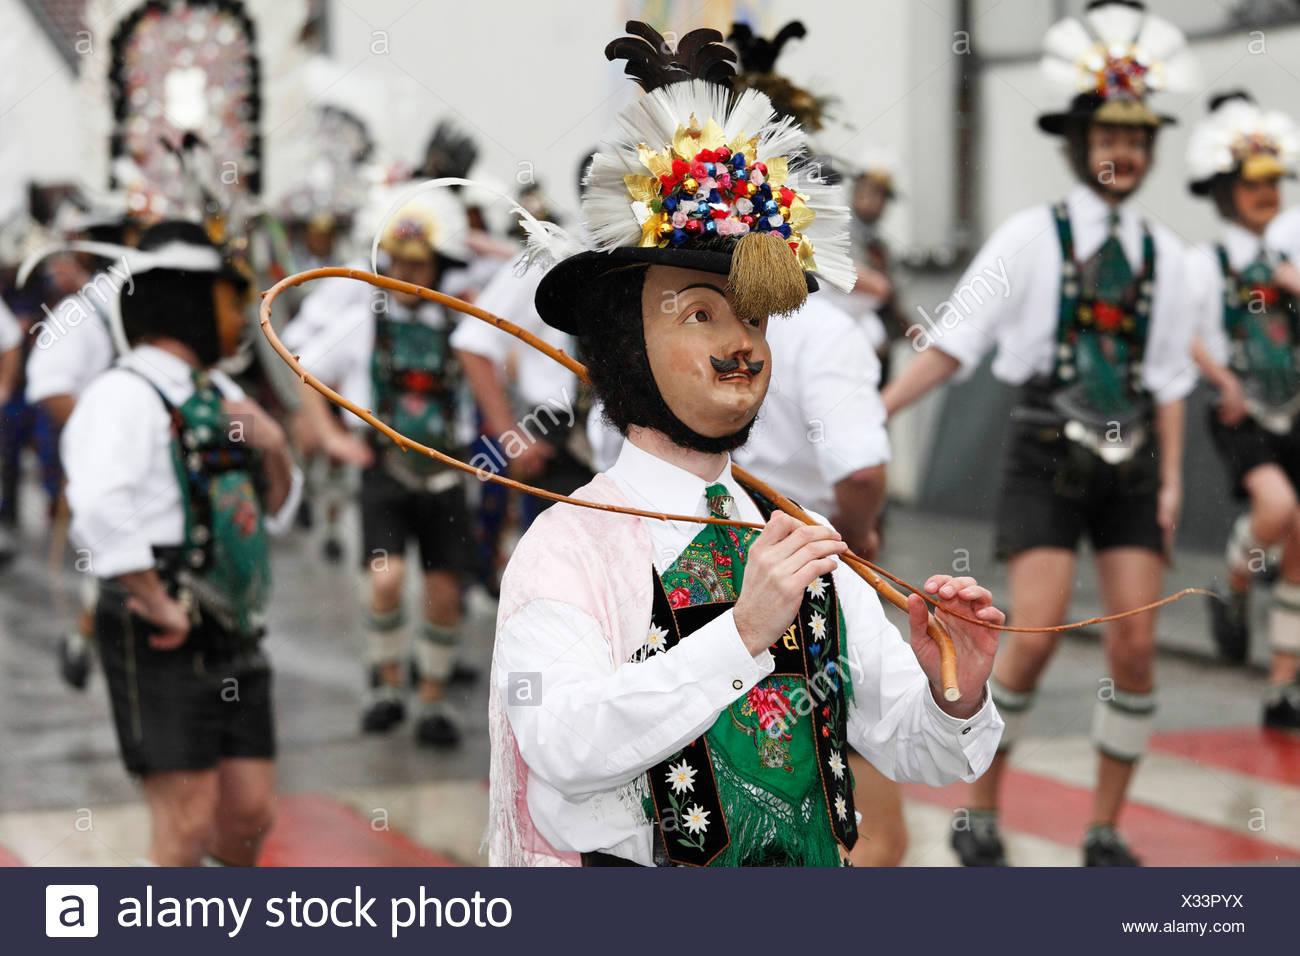 Mullerlaufen-Parade in Thaur, Karneval Tradition, Tirol, Österreich Stockbild